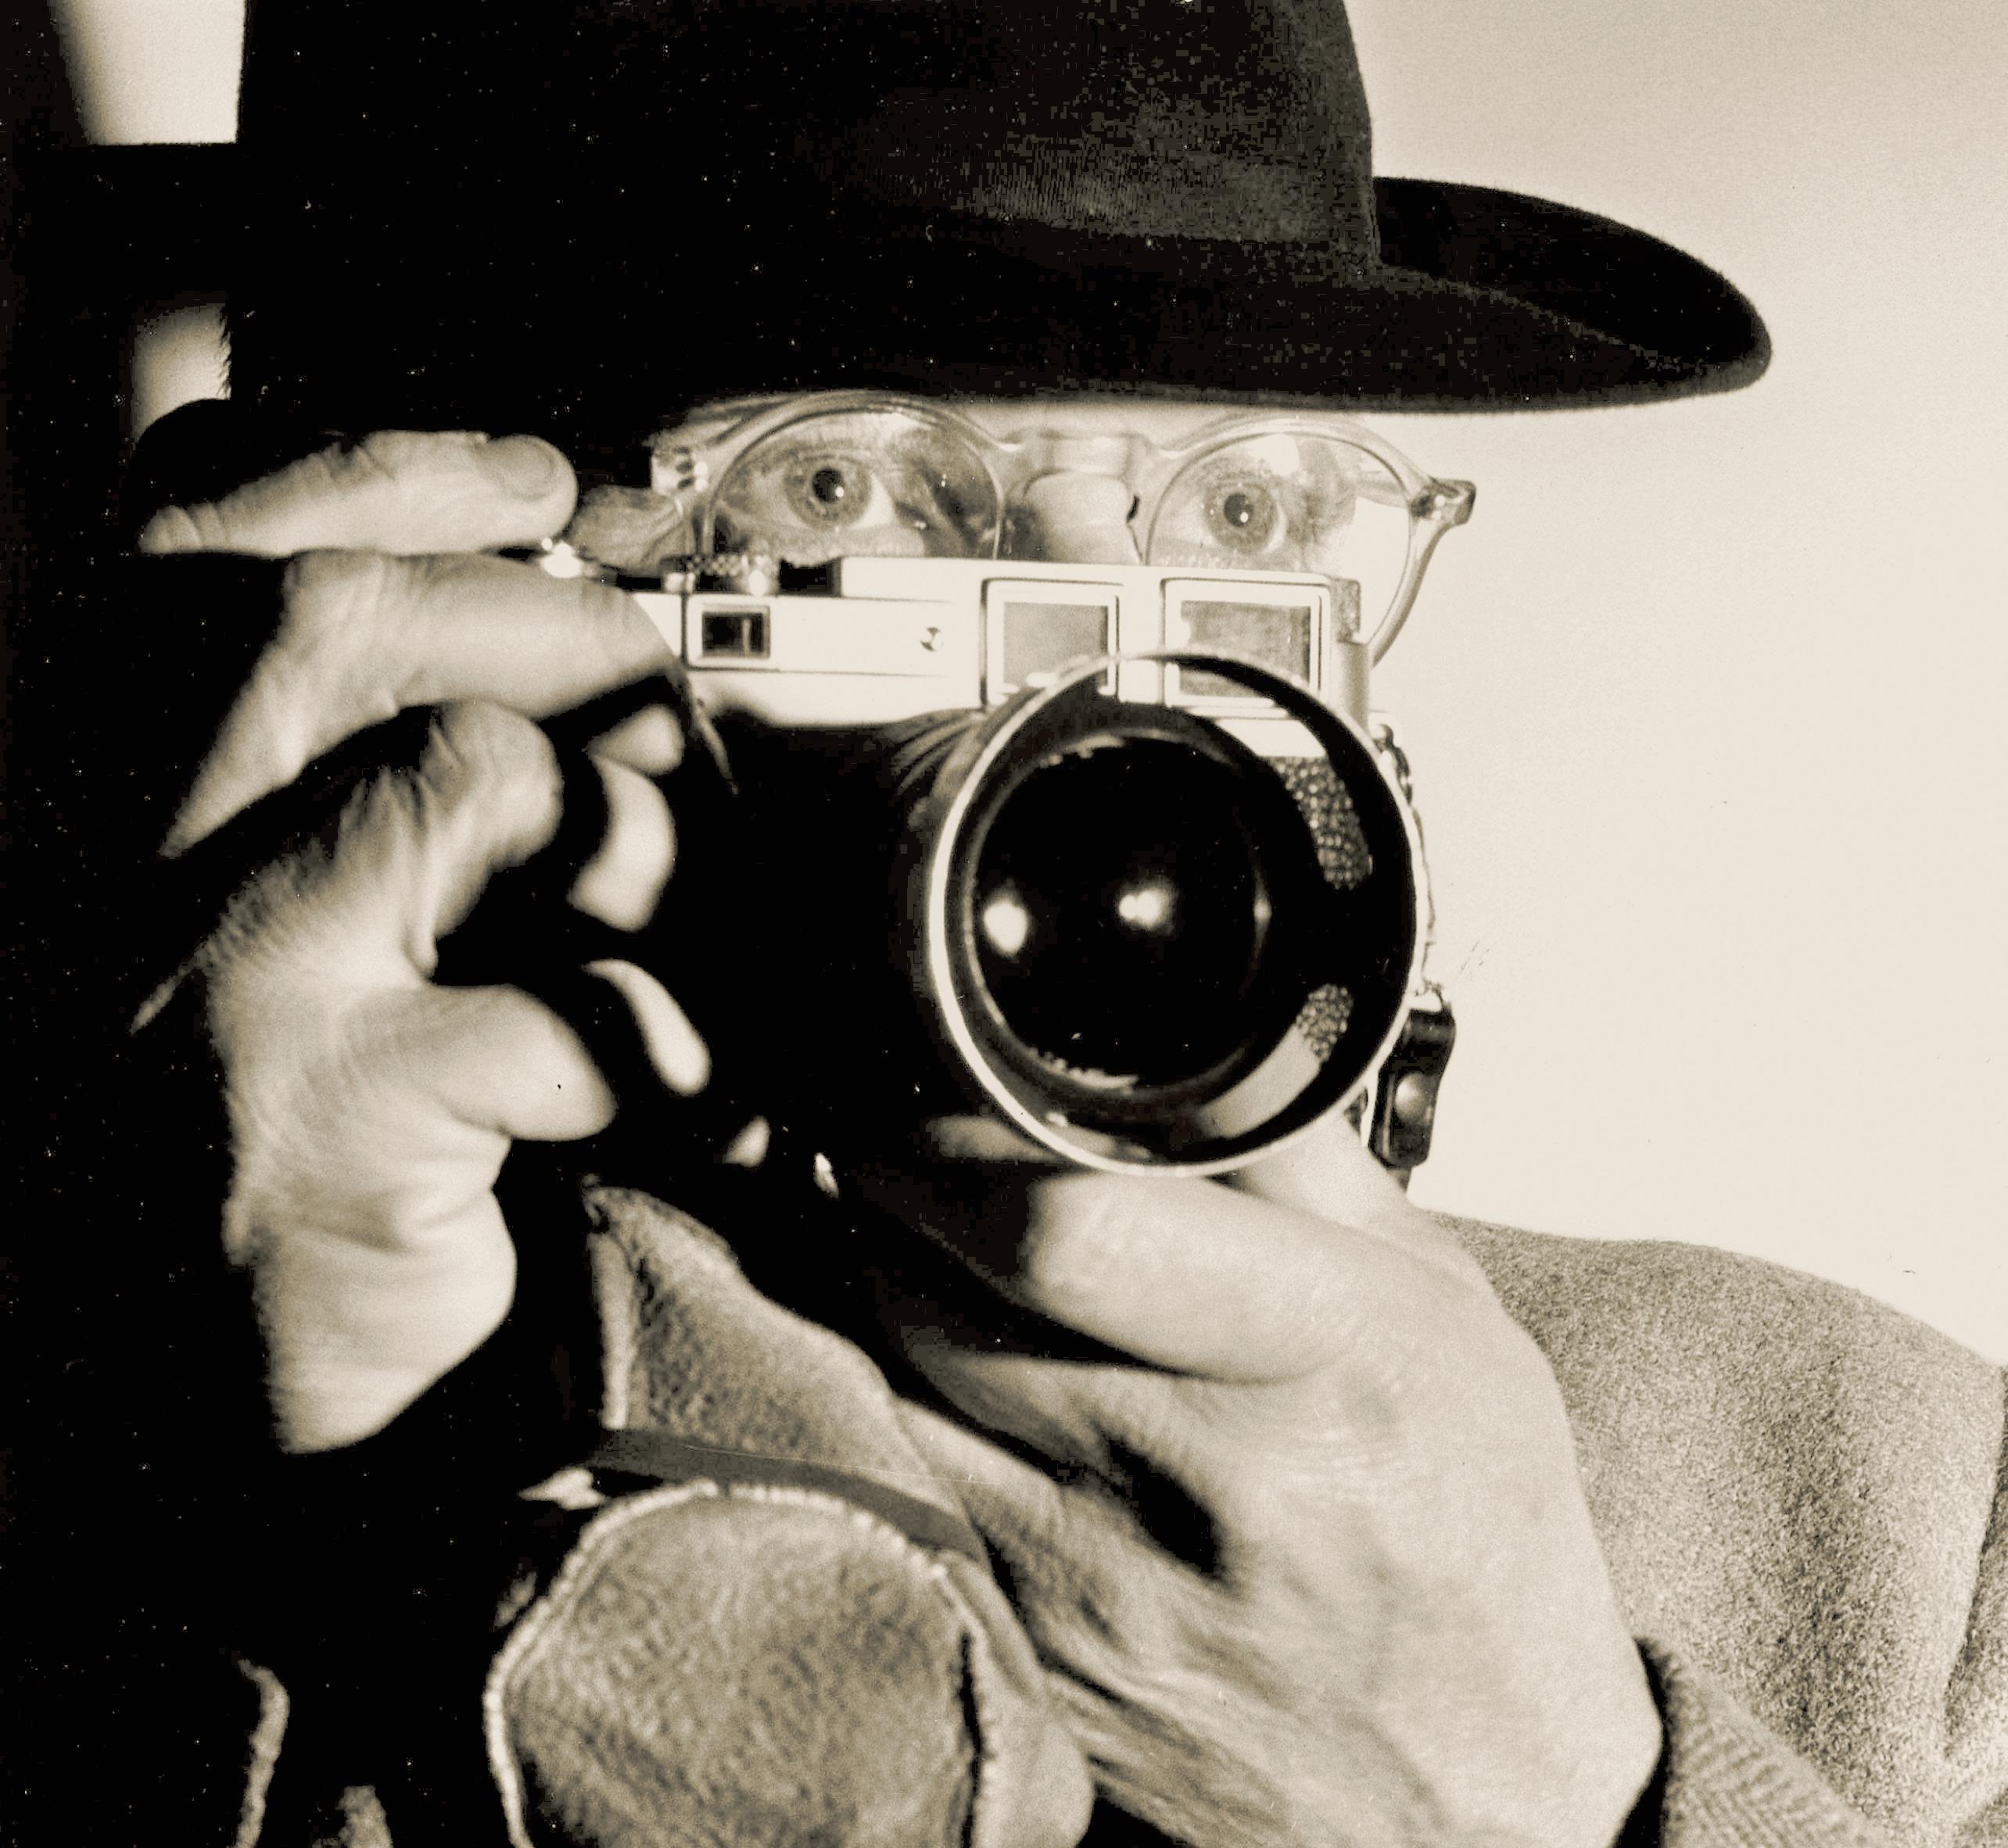 Pjesnik fotografije